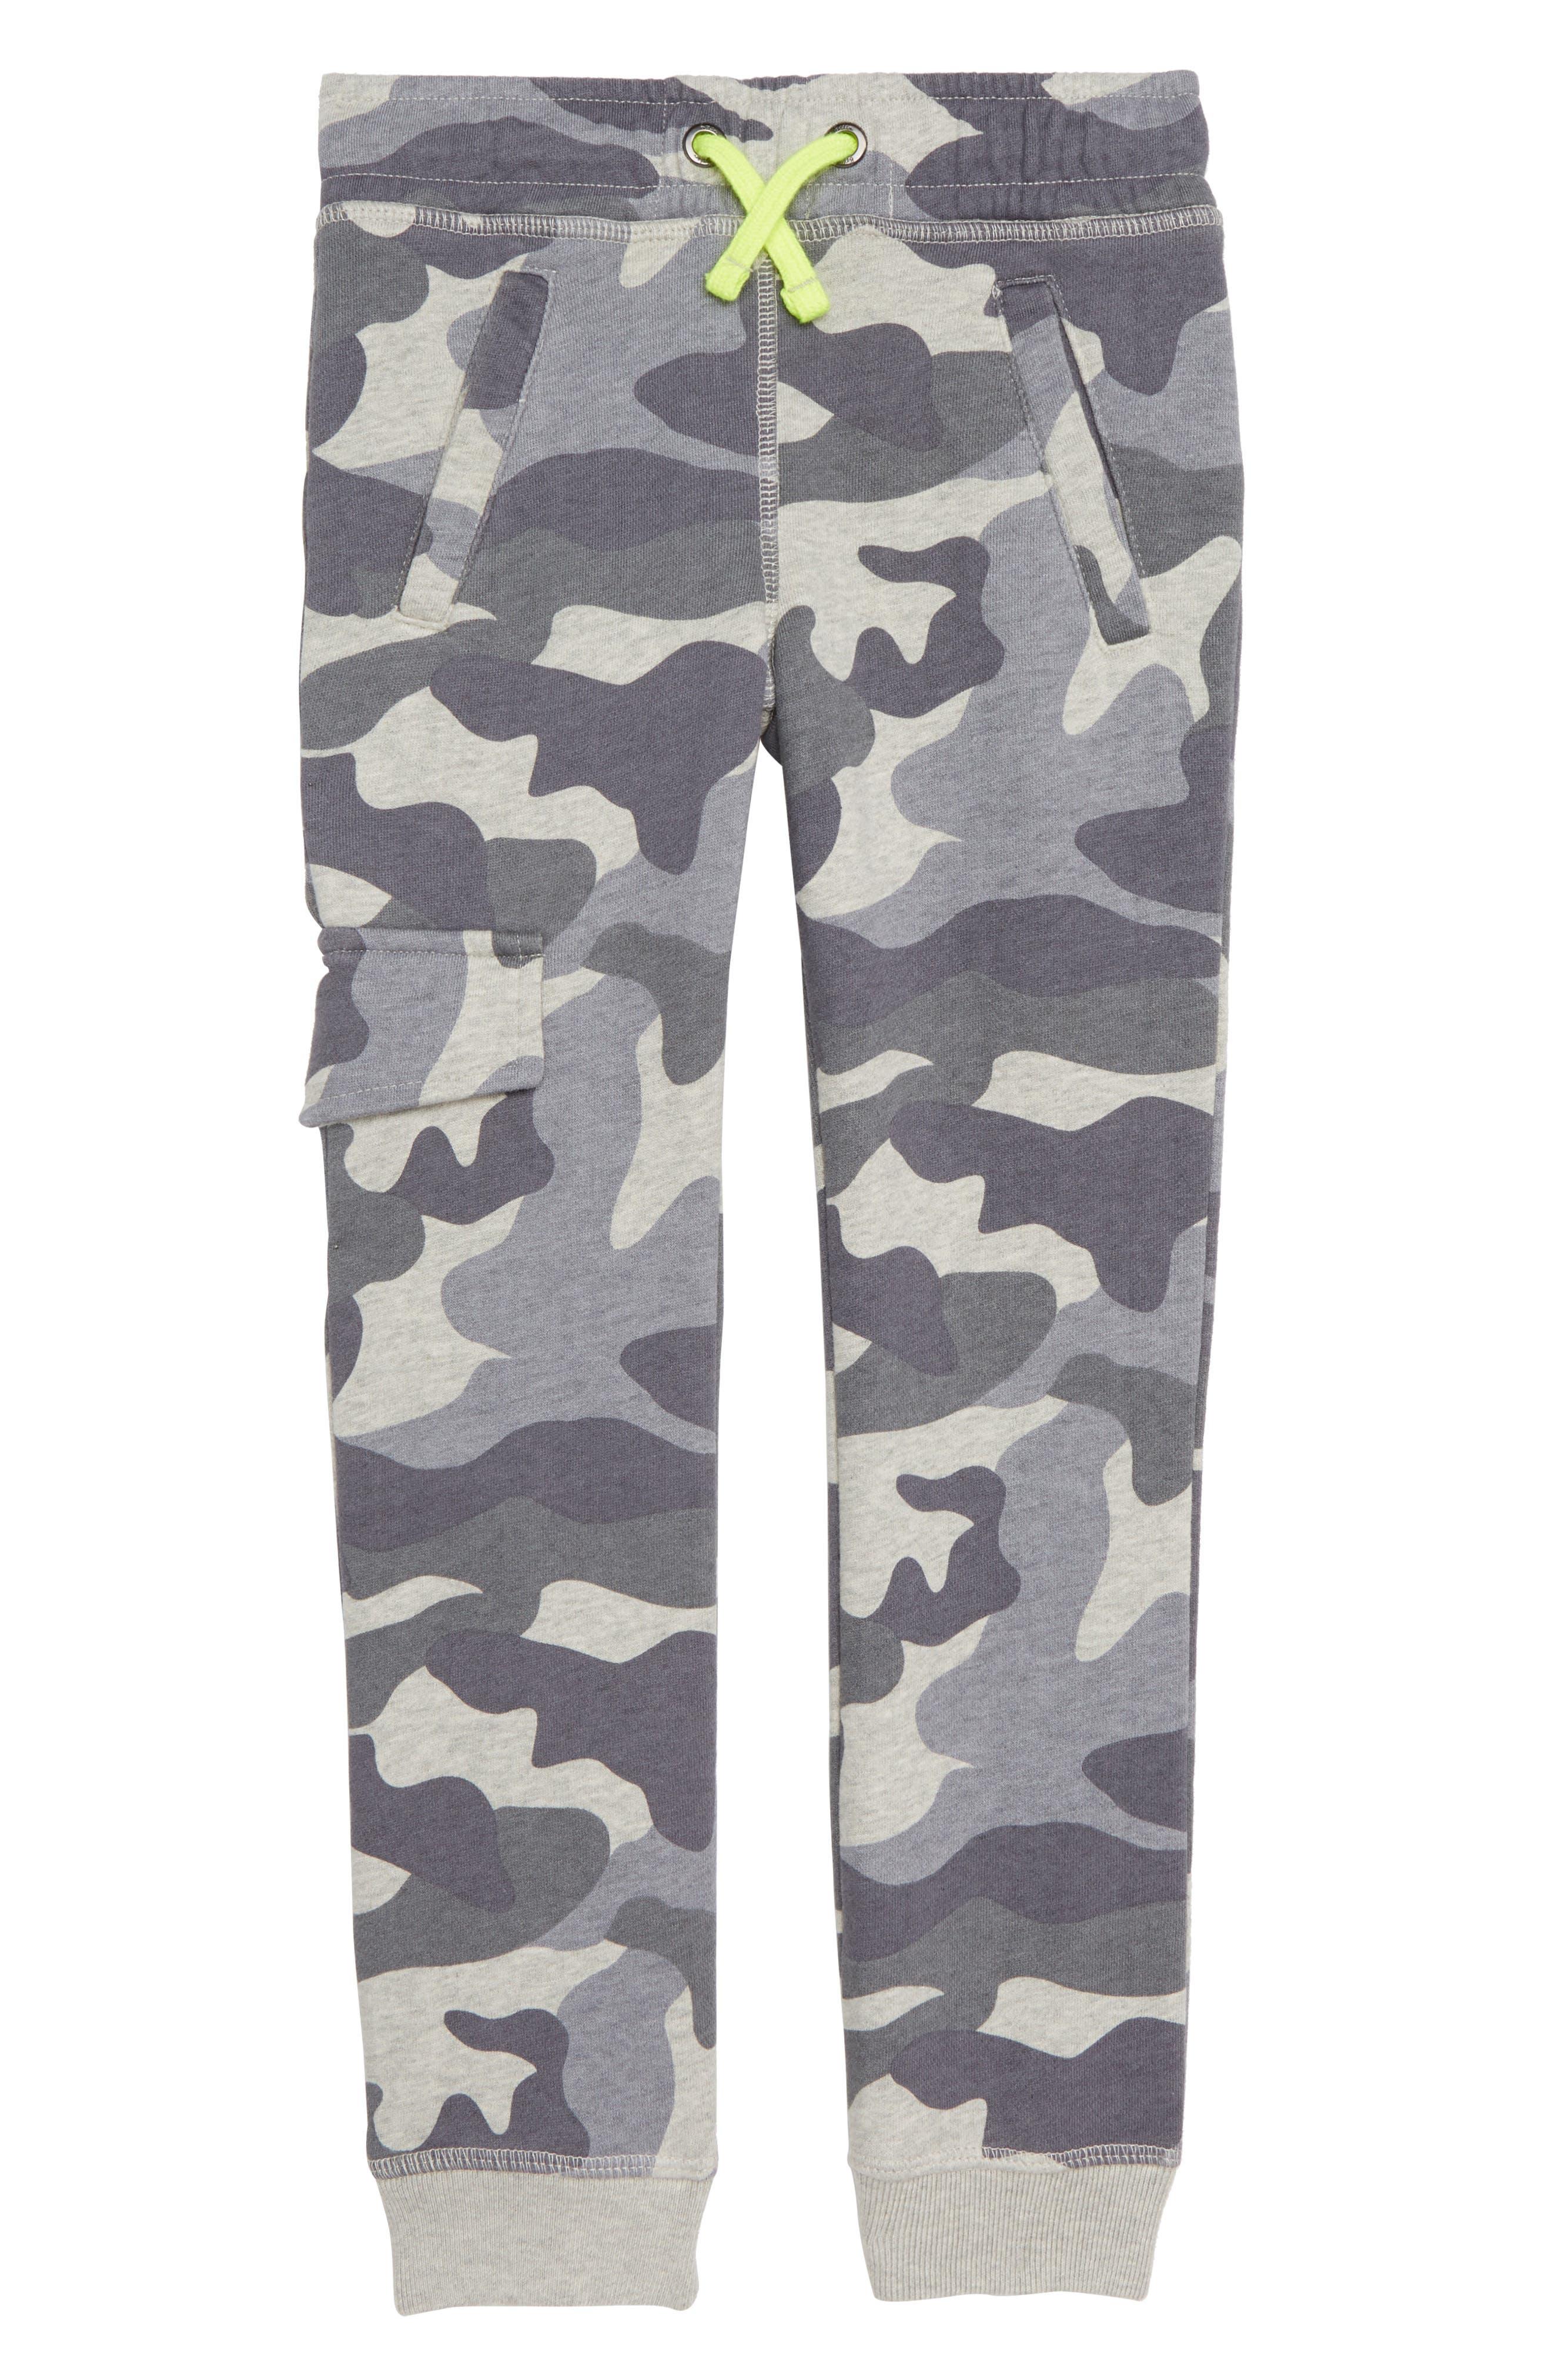 Camo Jersey Jogger Pants,                         Main,                         color, GREY MARL CAMO